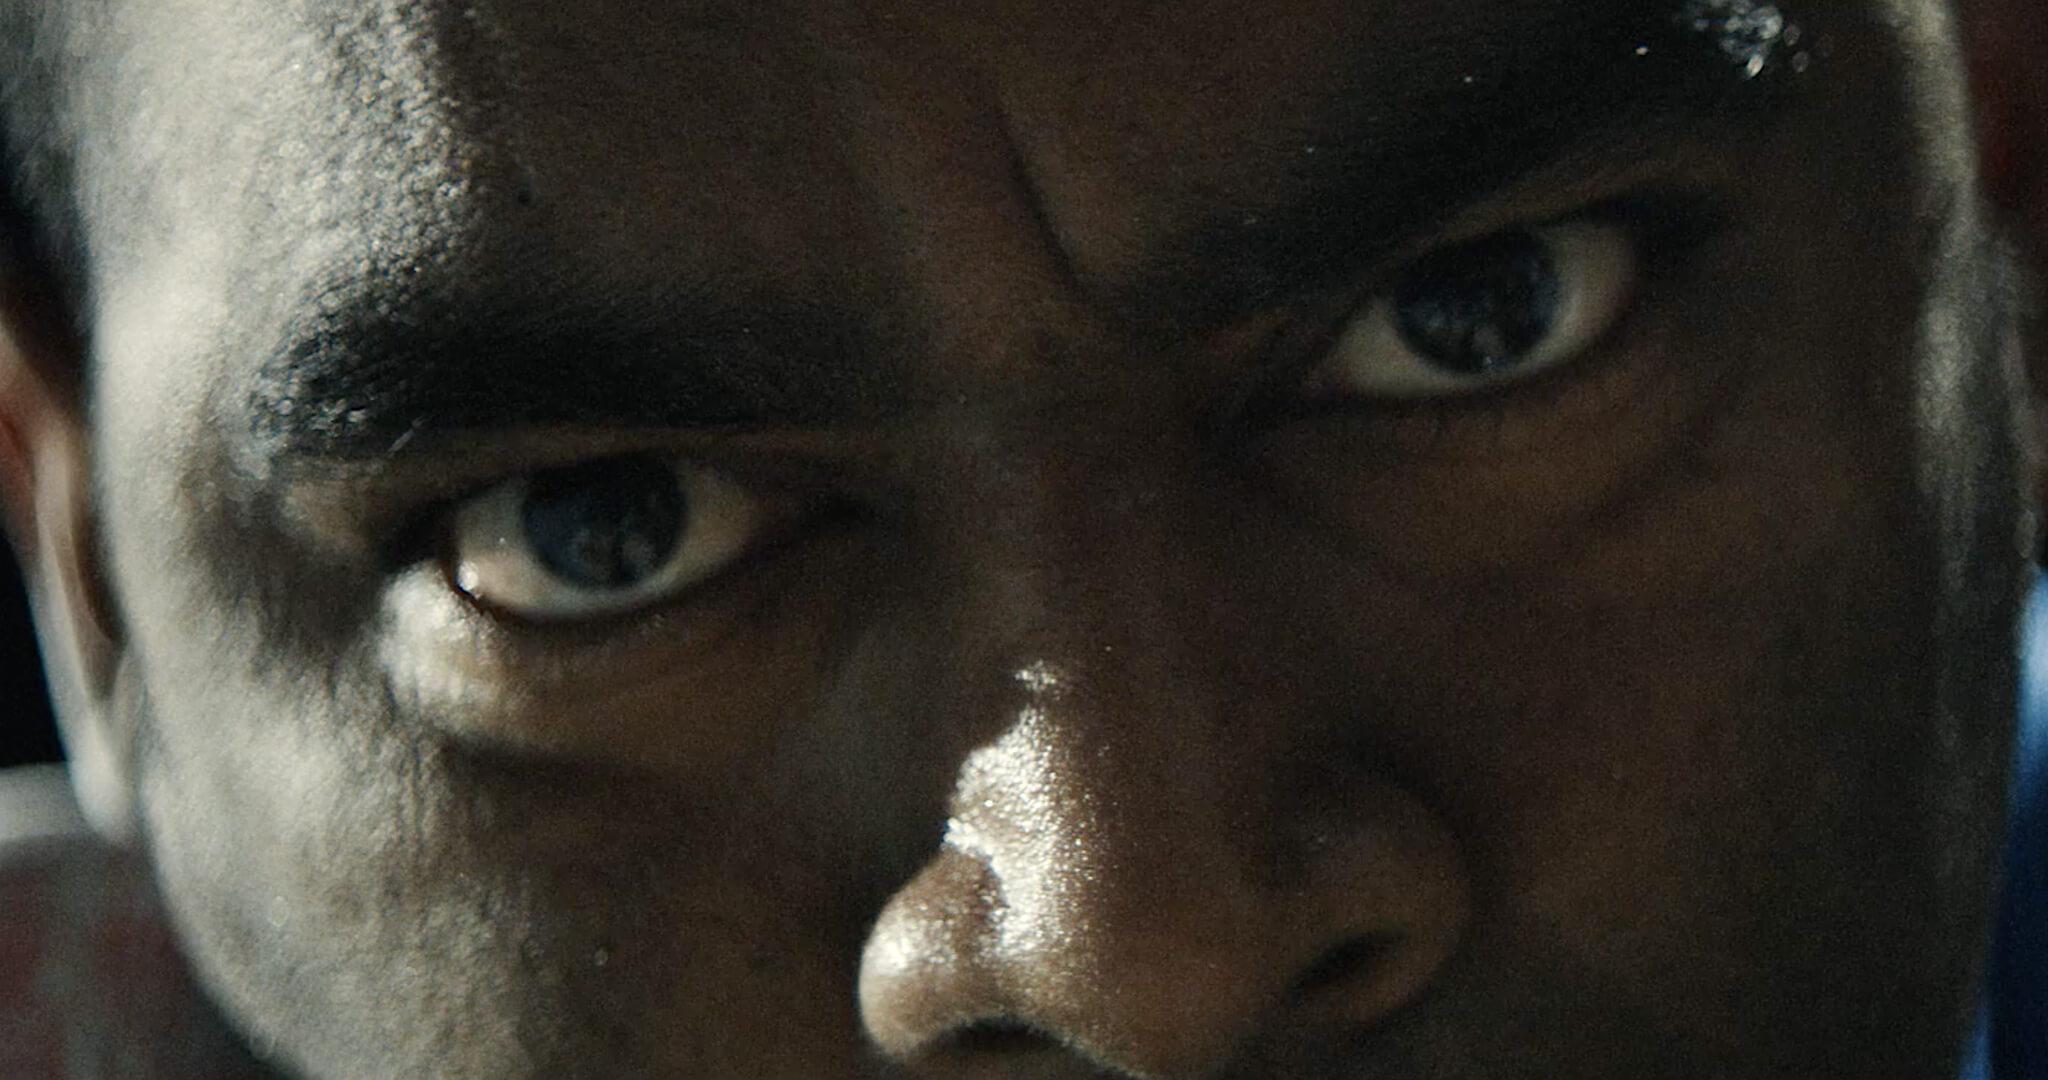 Tyrone